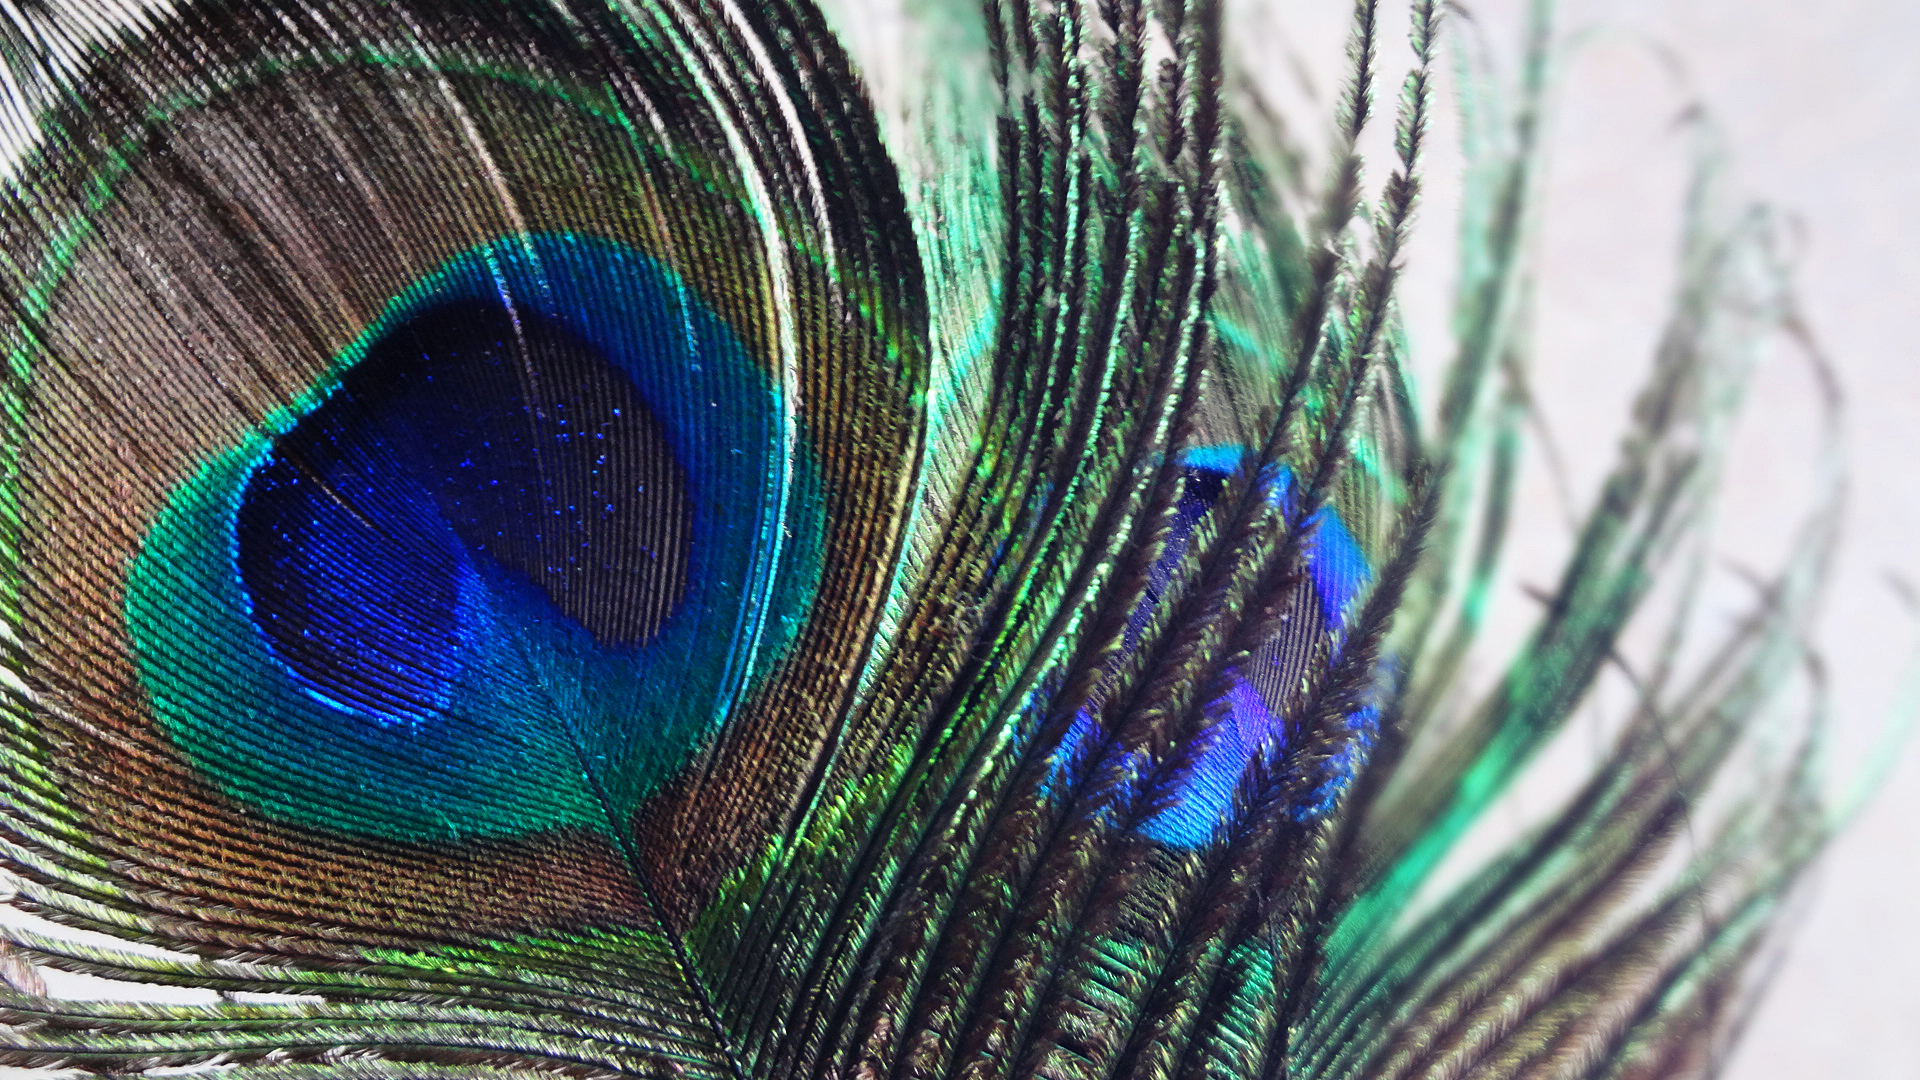 Feather Wallpaper Download Desktop Peacock Hd 1920x1080